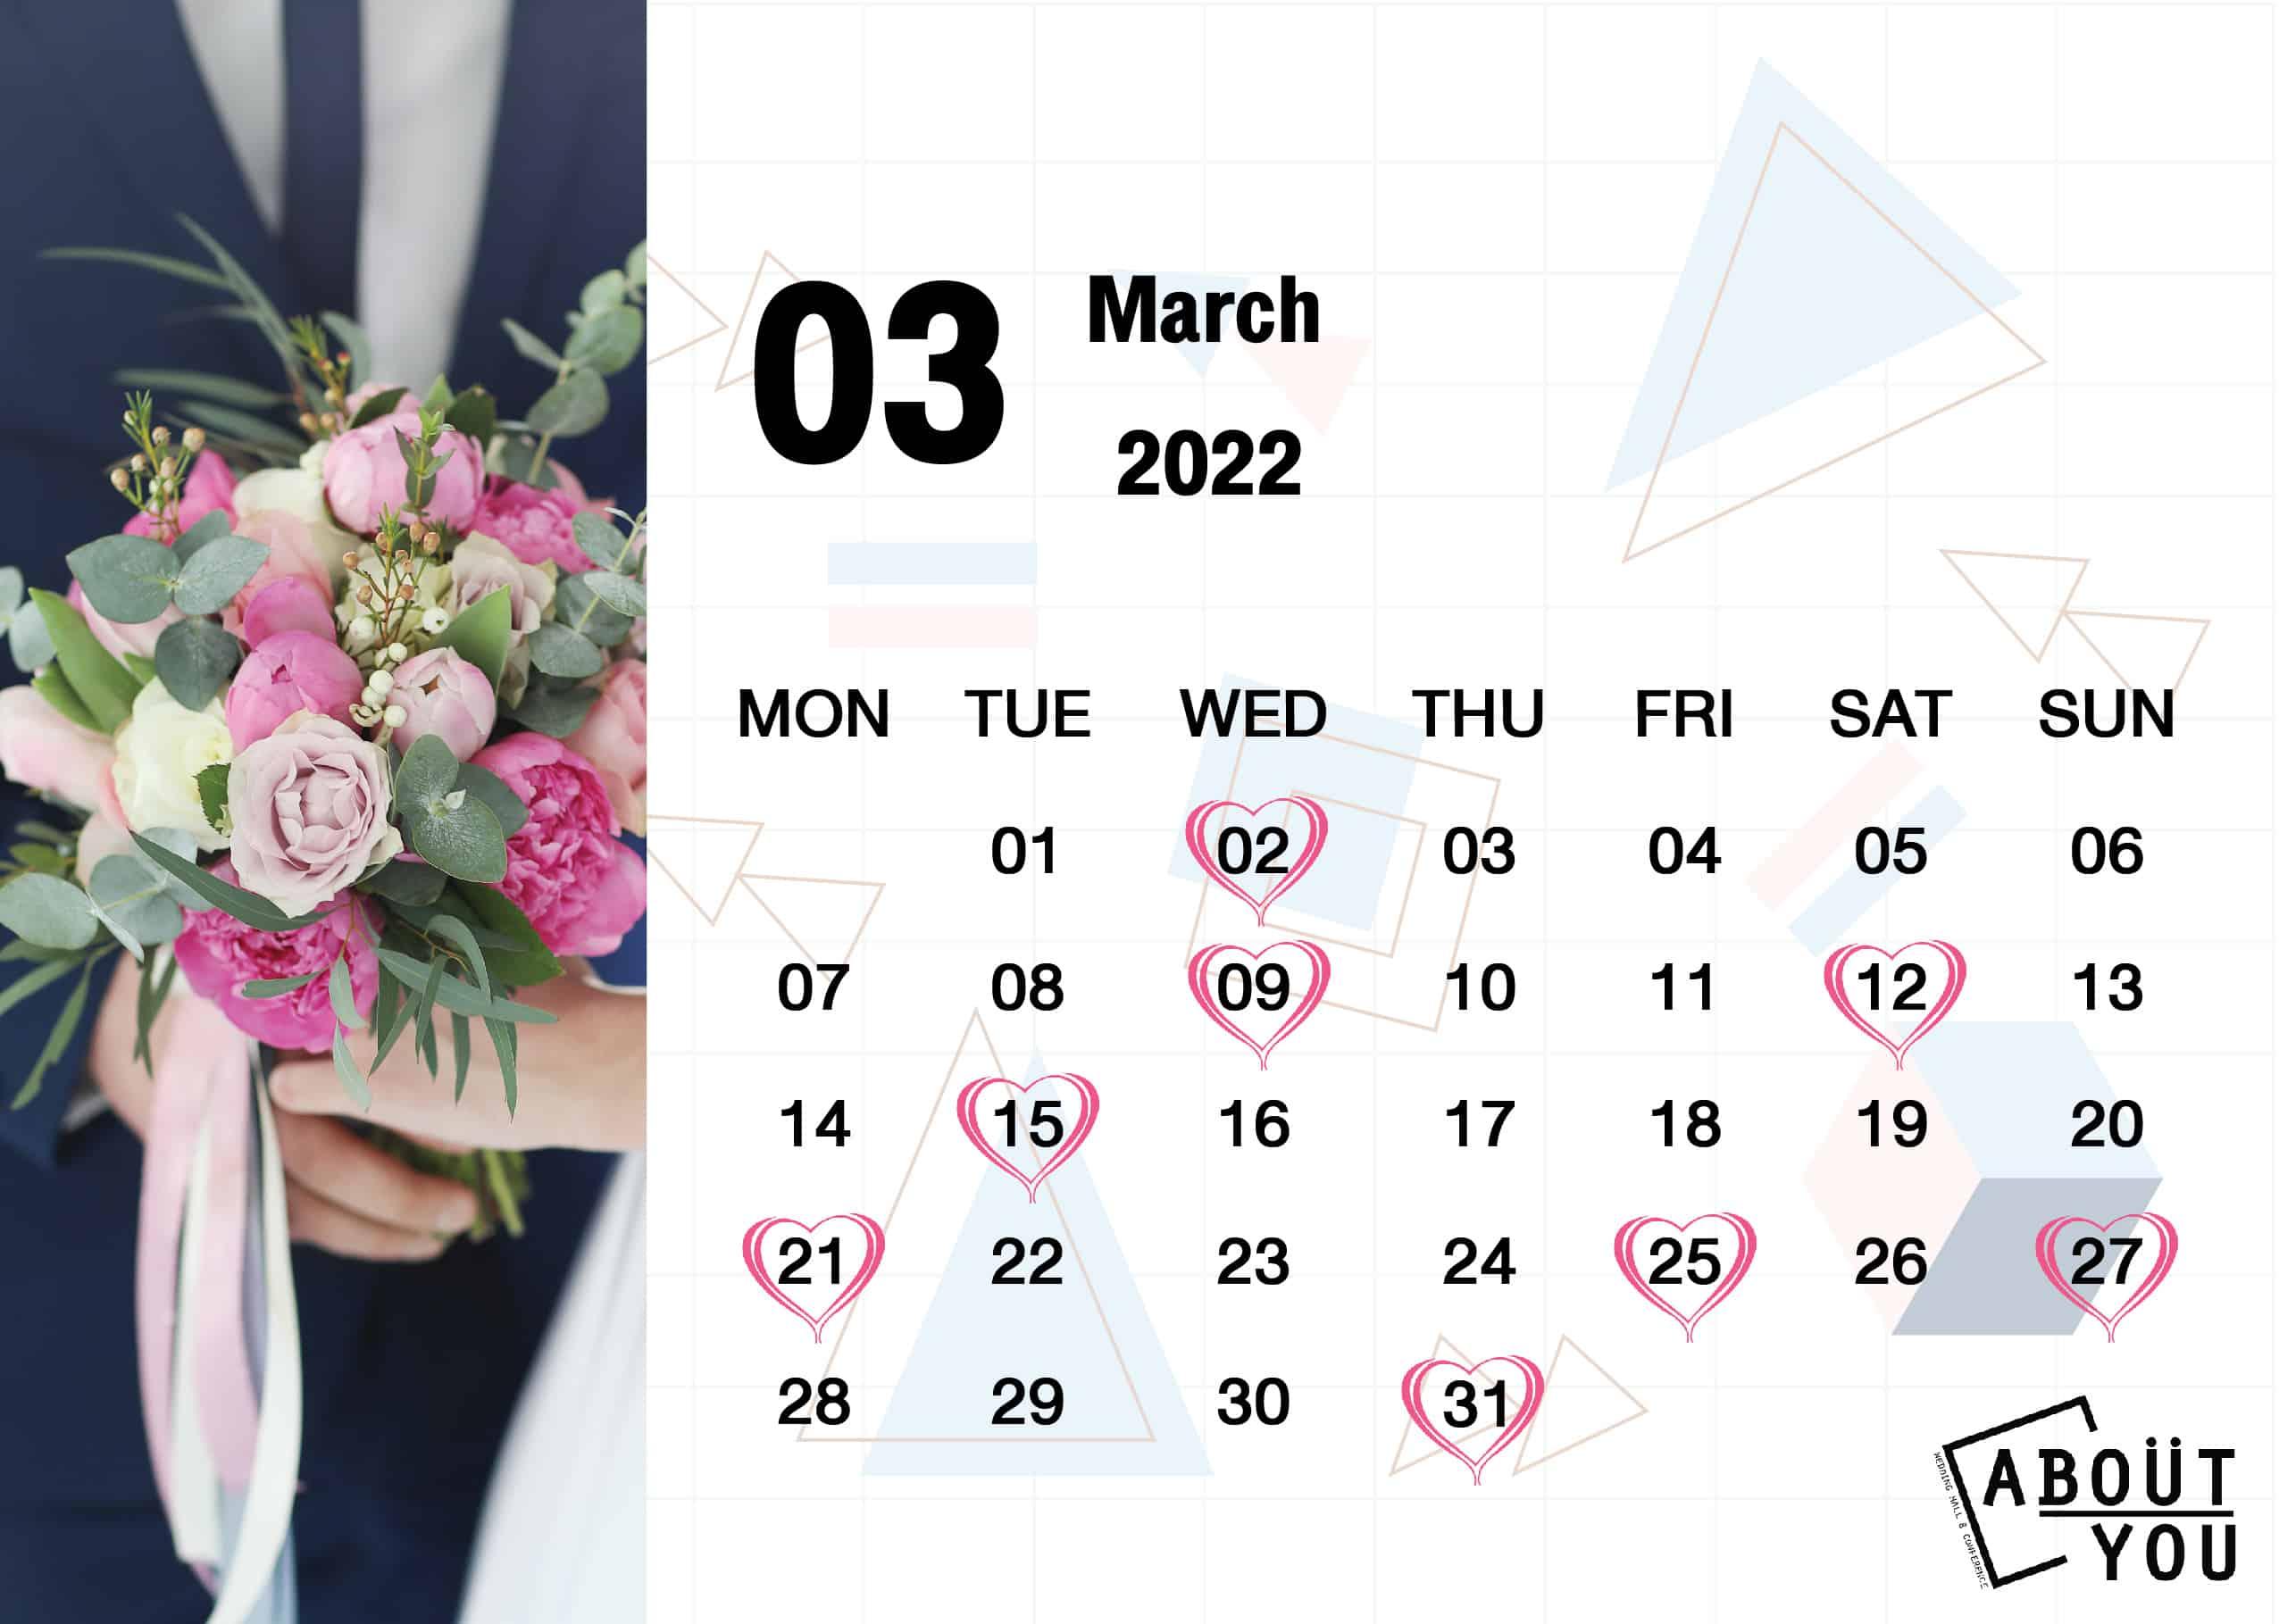 calendar About you-04